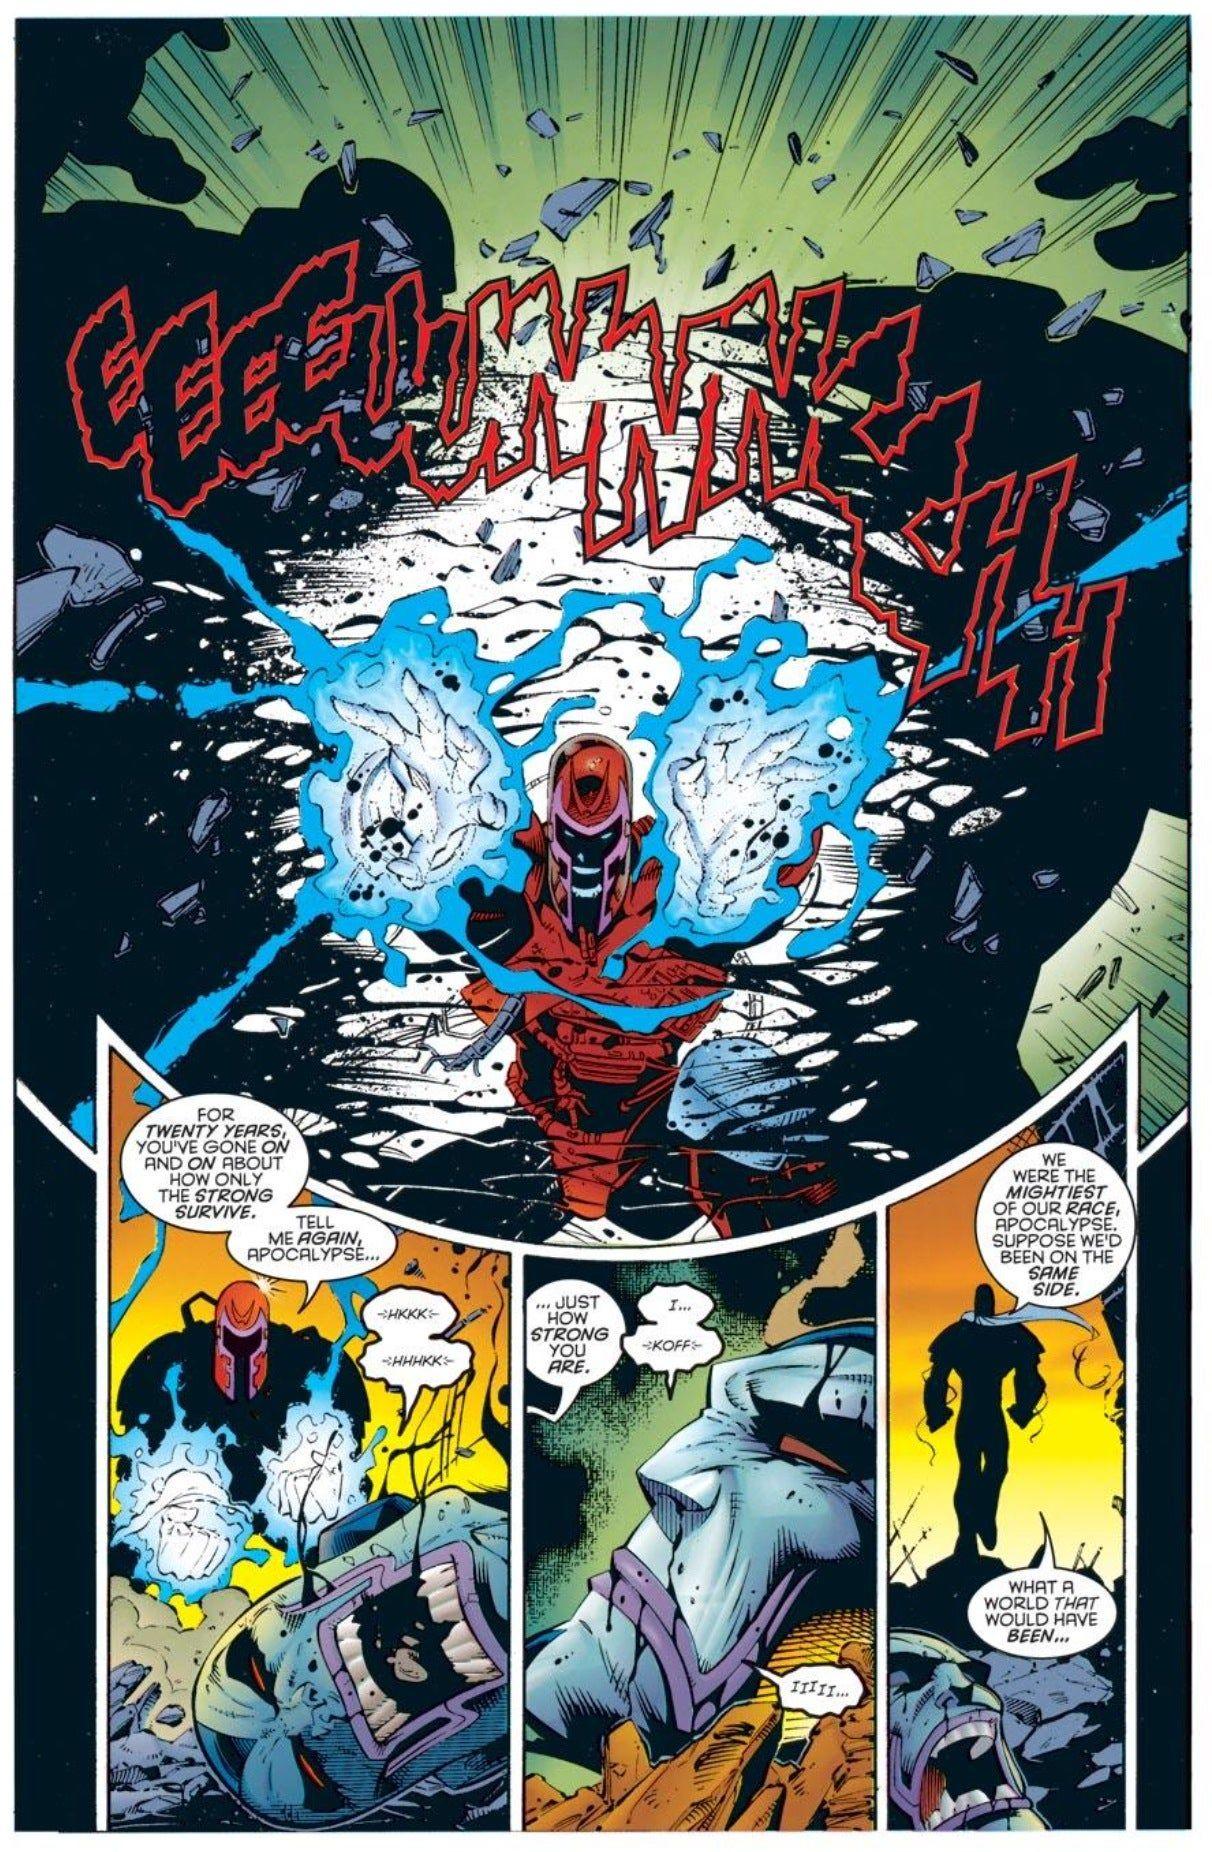 75 Most Iconic Marvel Comics Moments 75 61 Comics Apocalypse Marvel